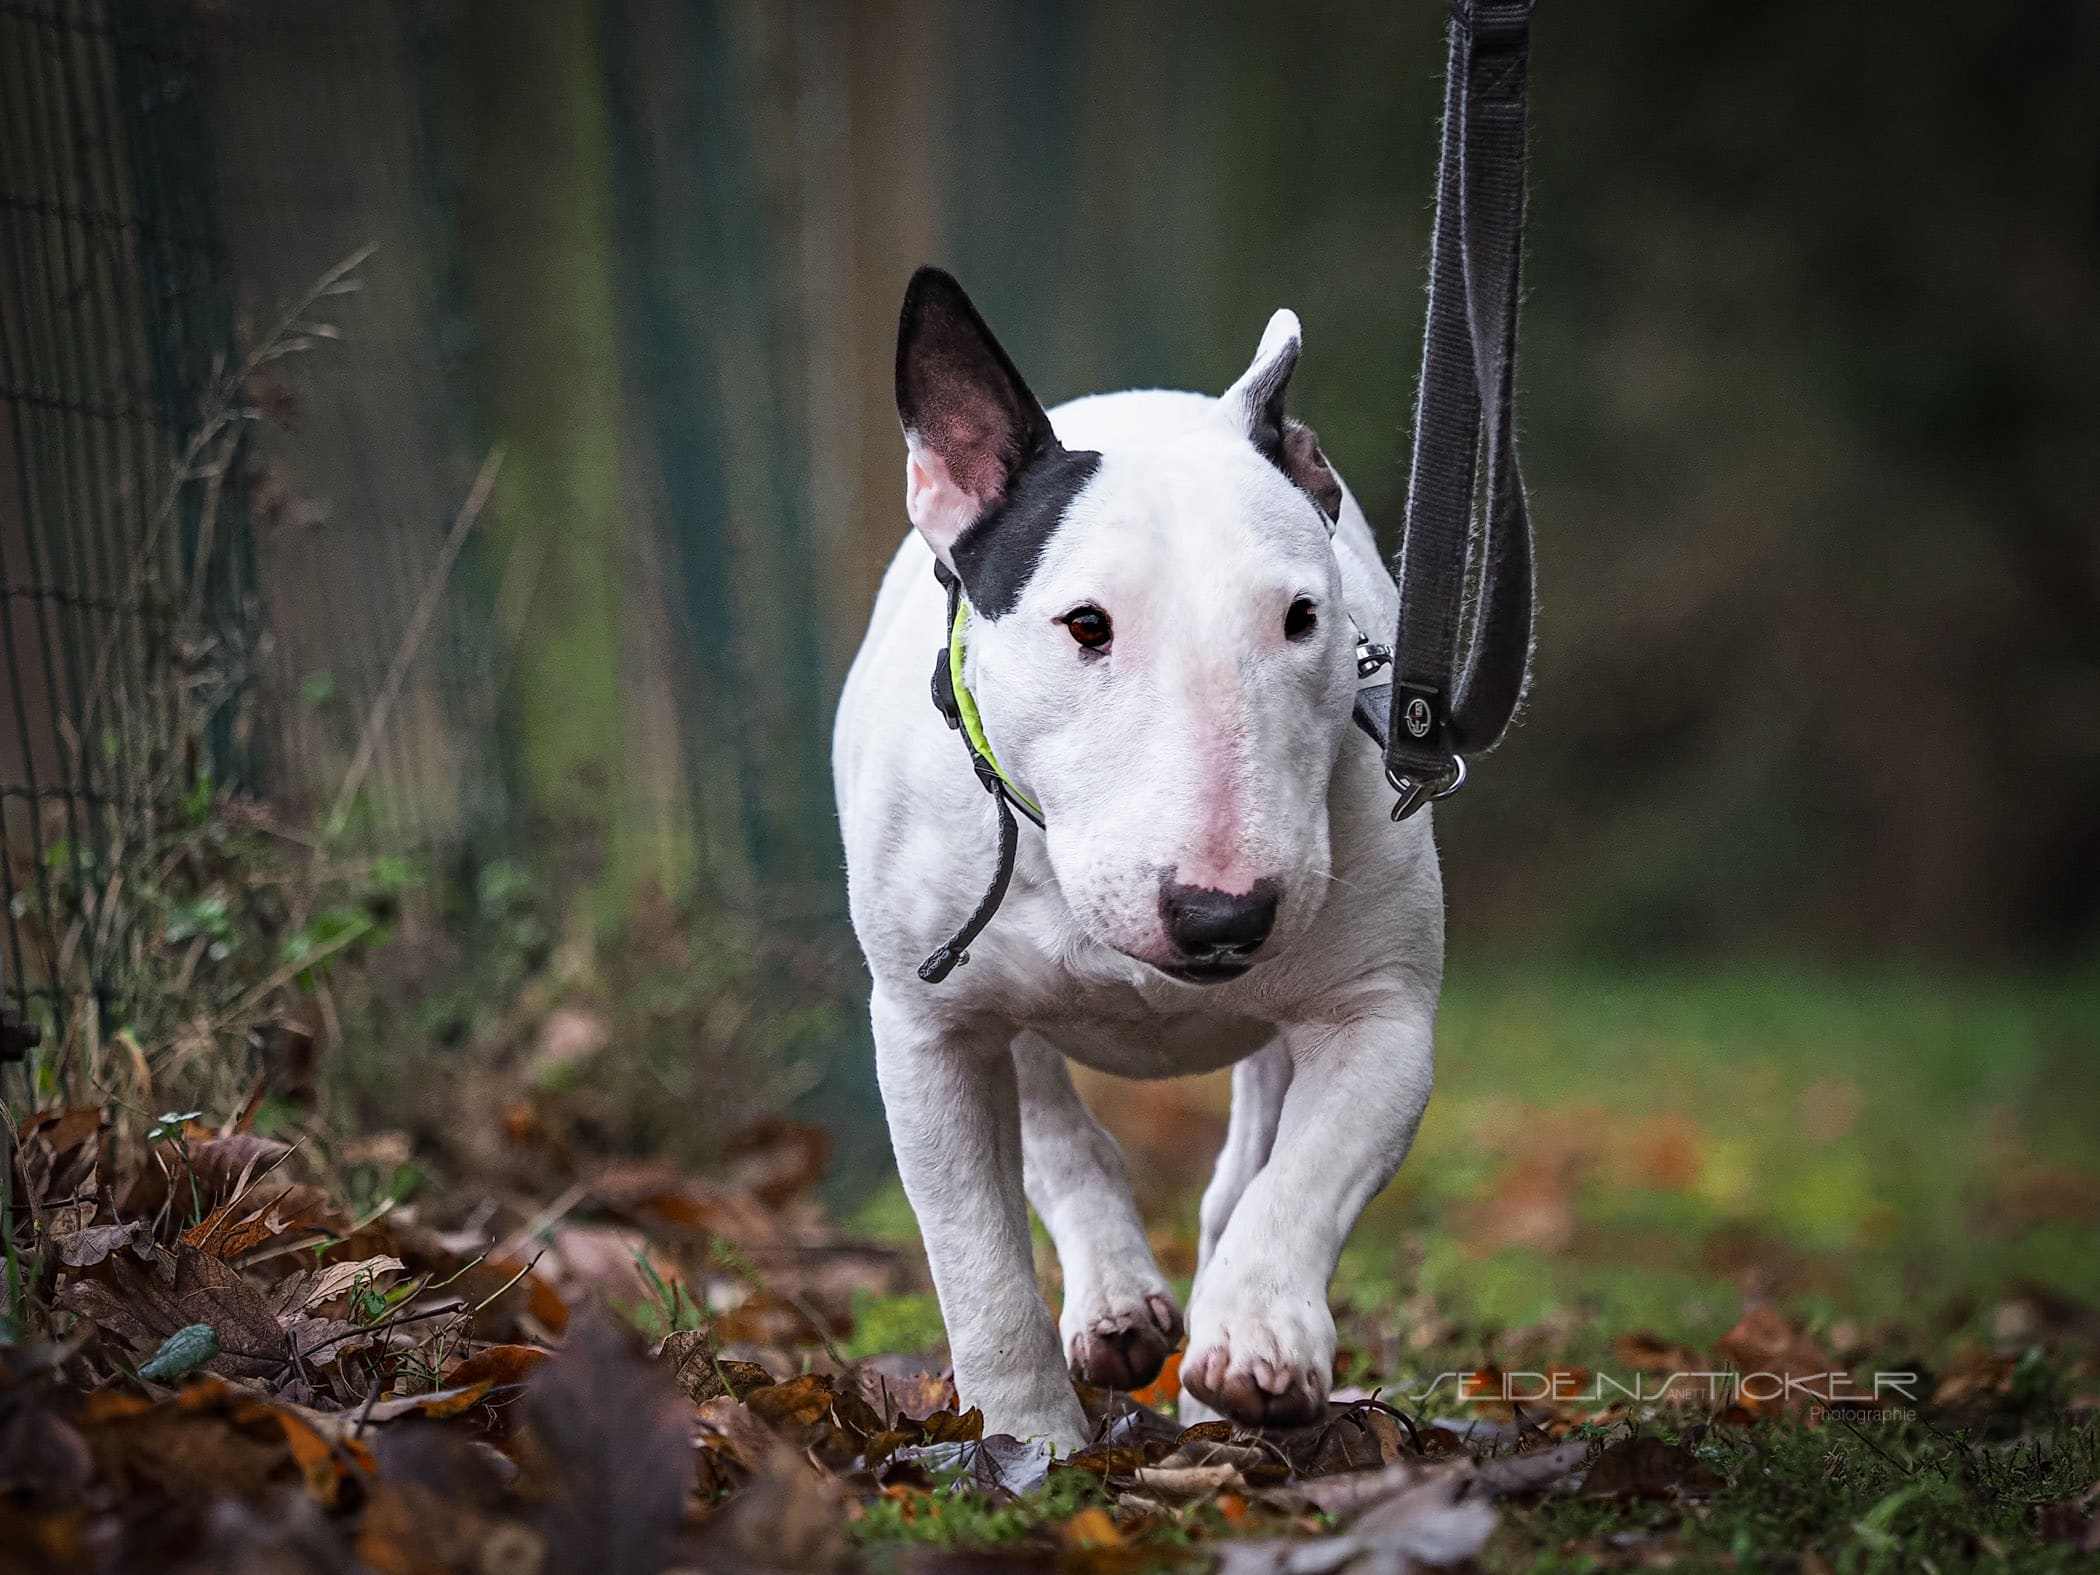 Seidensticker Fotografie - Hundeschule Bruns